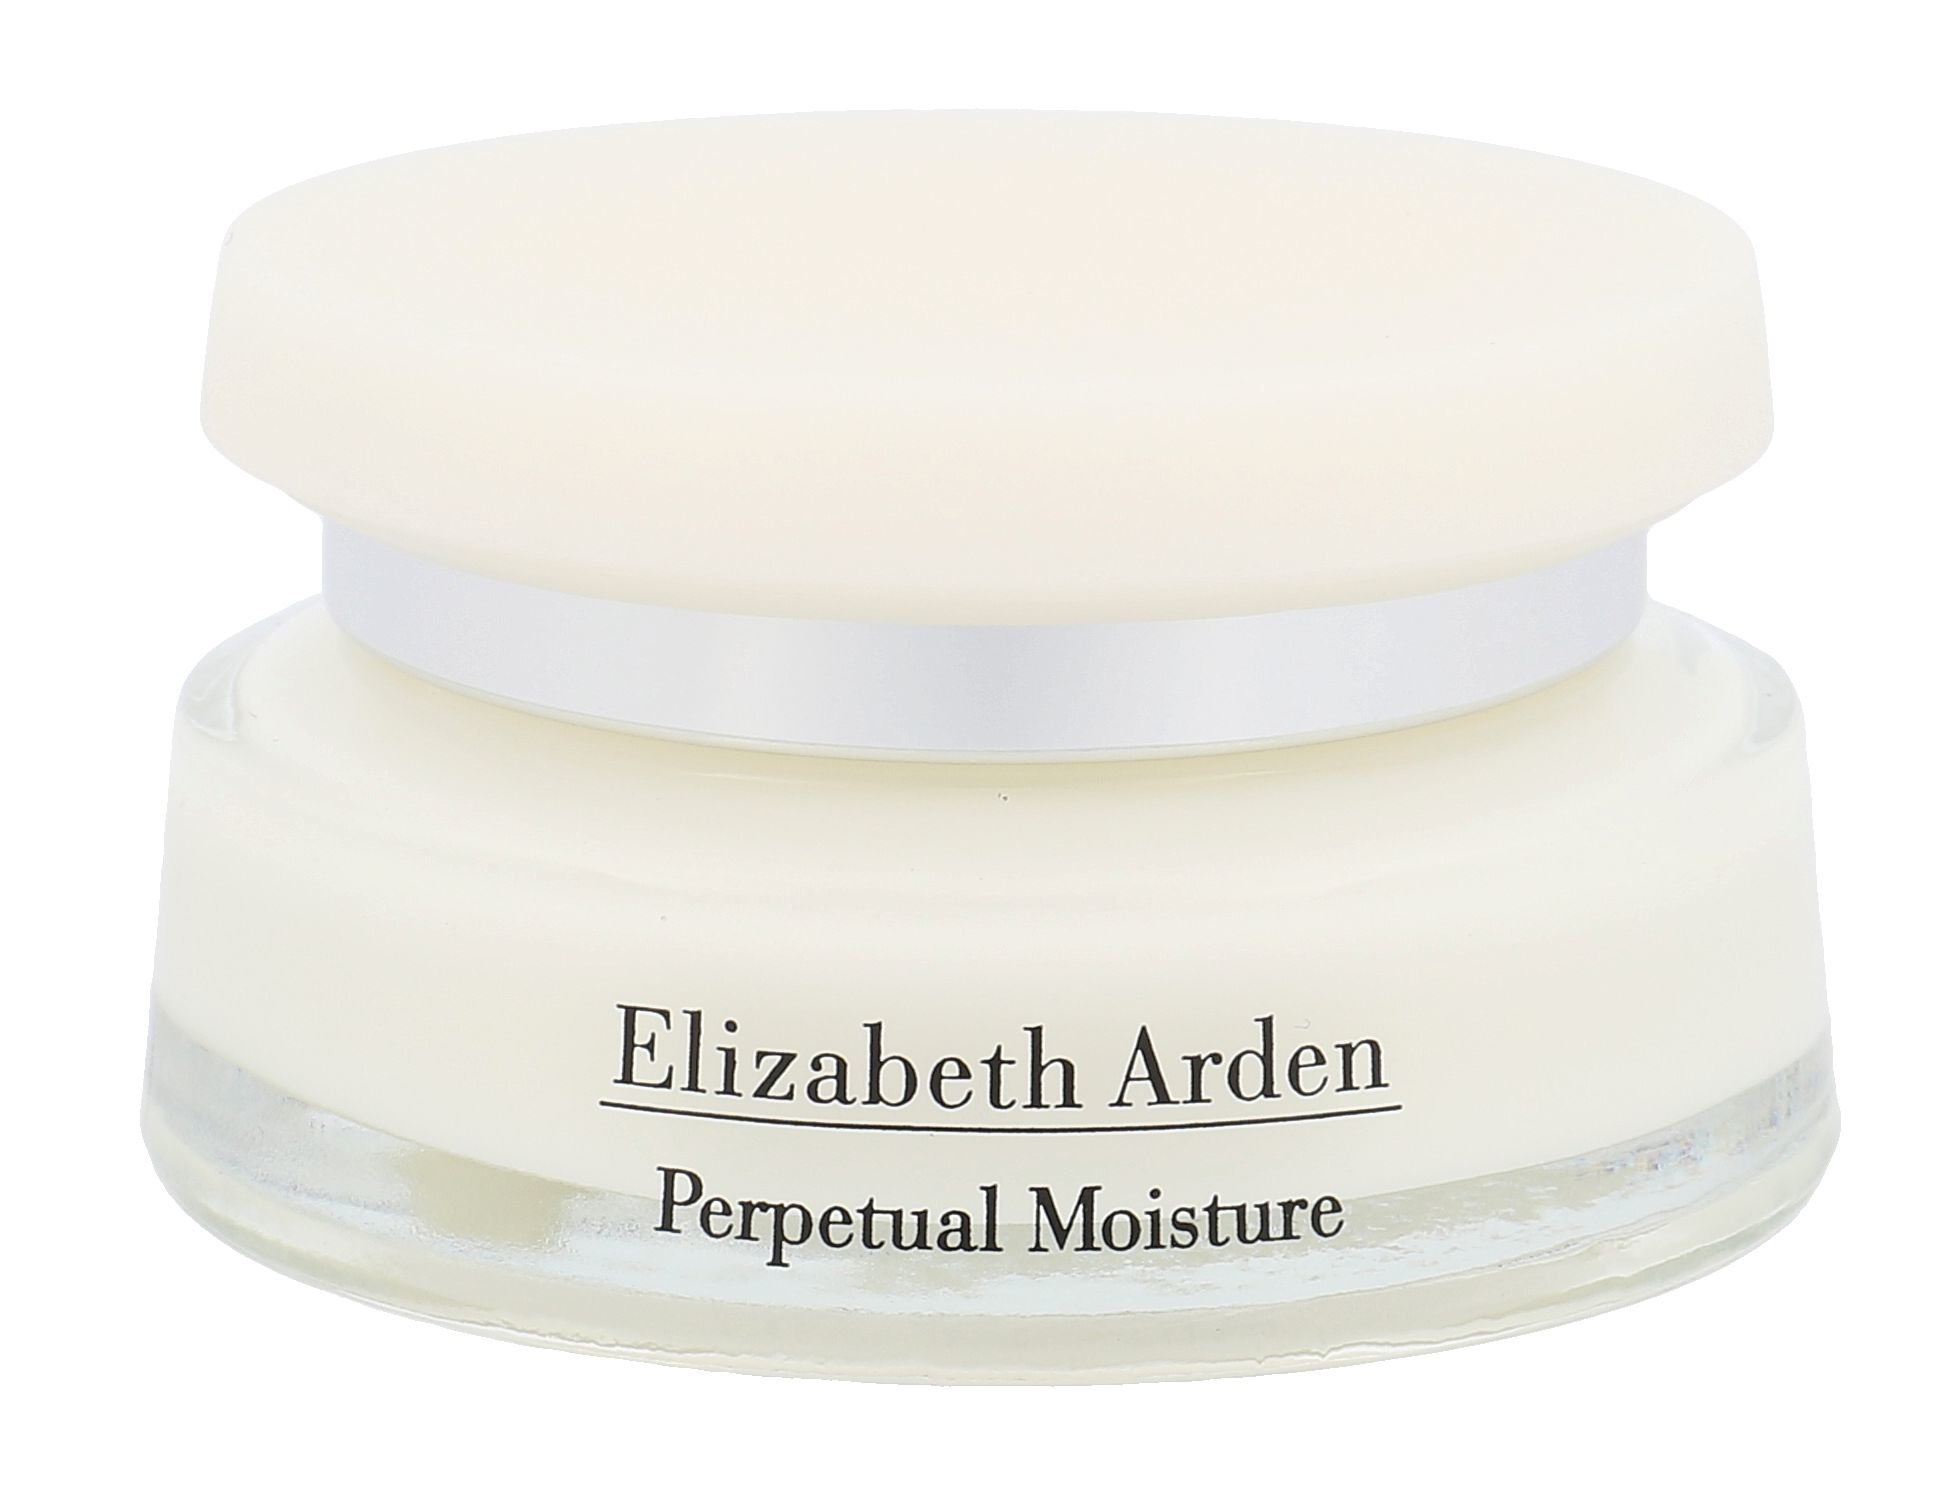 Elizabeth Arden Perpetual Moisture Cosmetic 50ml